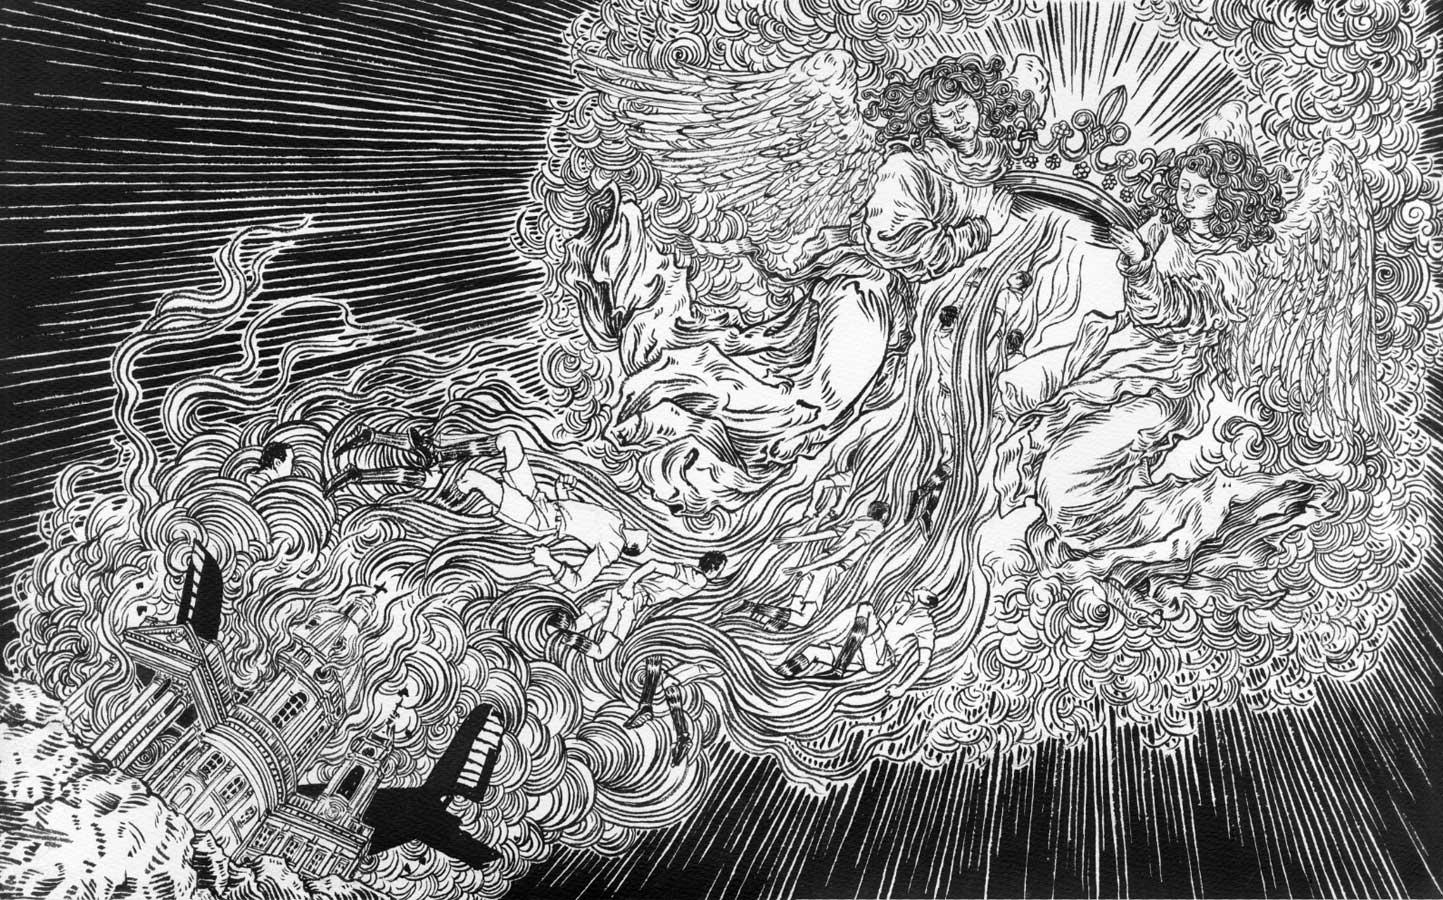 Yuko Shimizu - 8by8 Tragedy of Il Grande Torino -